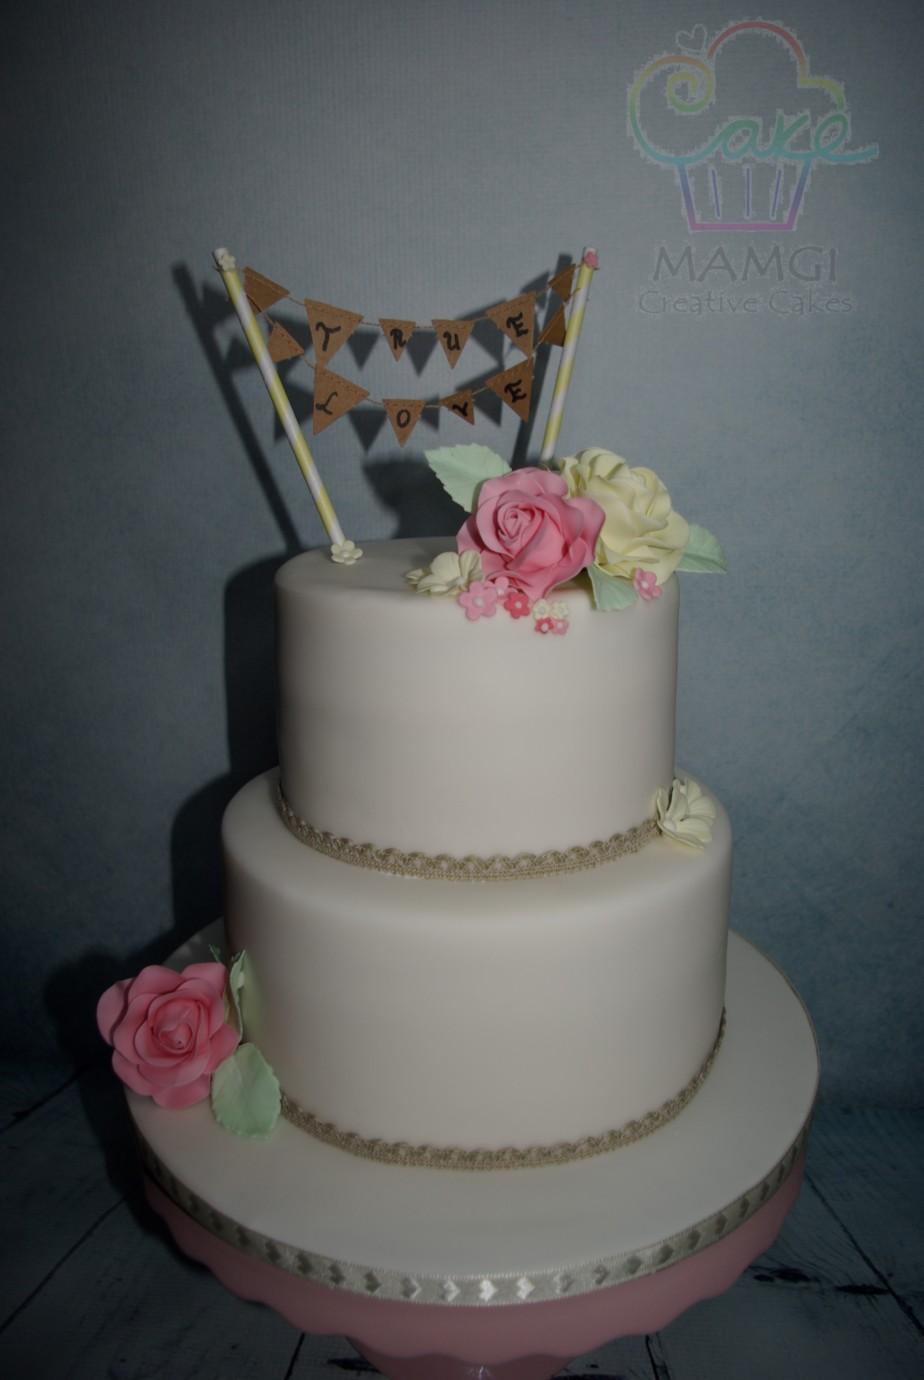 mamgi cakes 2